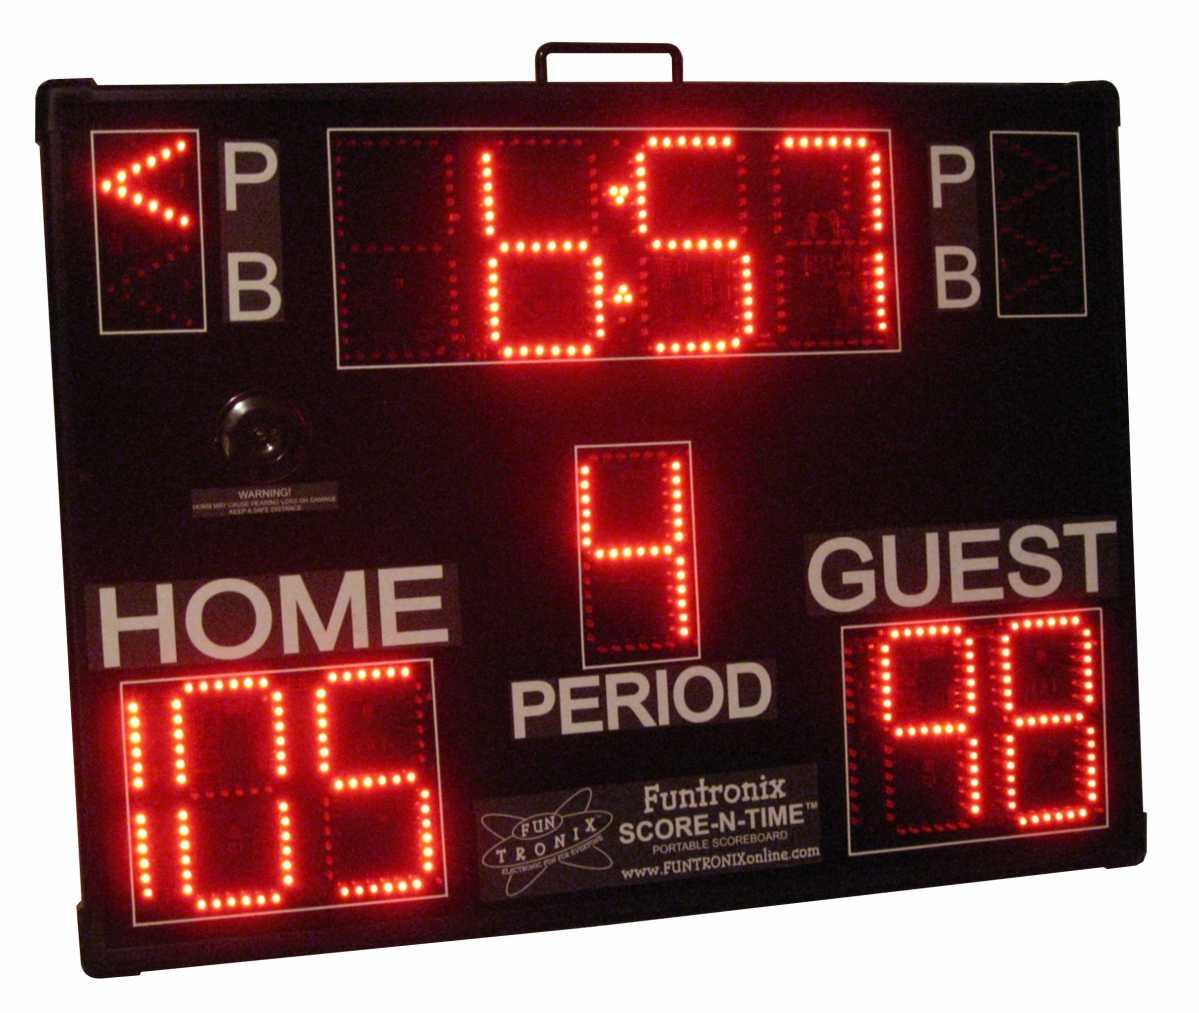 Large Portable Multisport Scoreboard